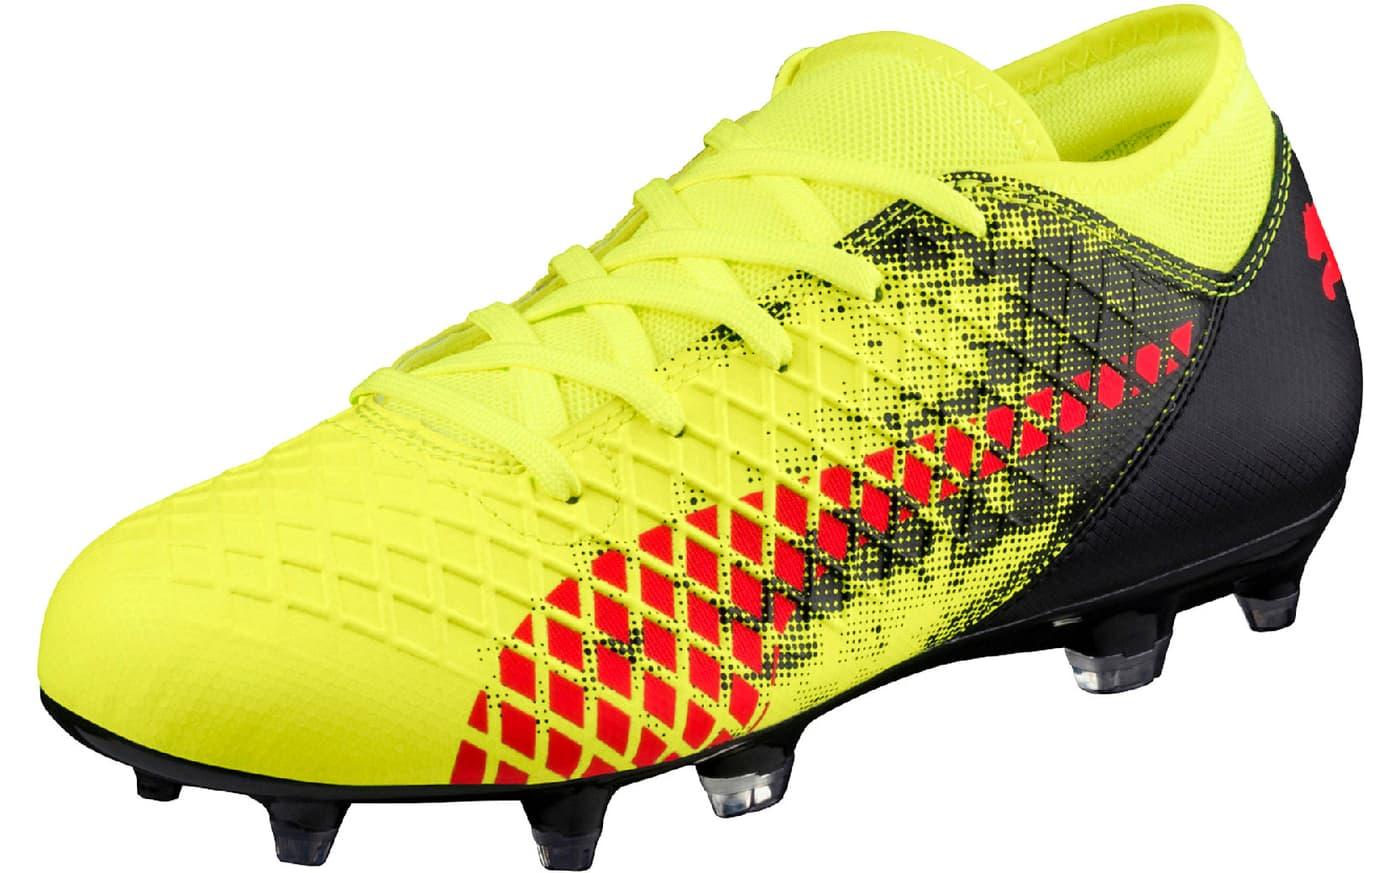 Football 18 Future Chaussures 4 De Pour Enfant Puma Fgag XPkuZi